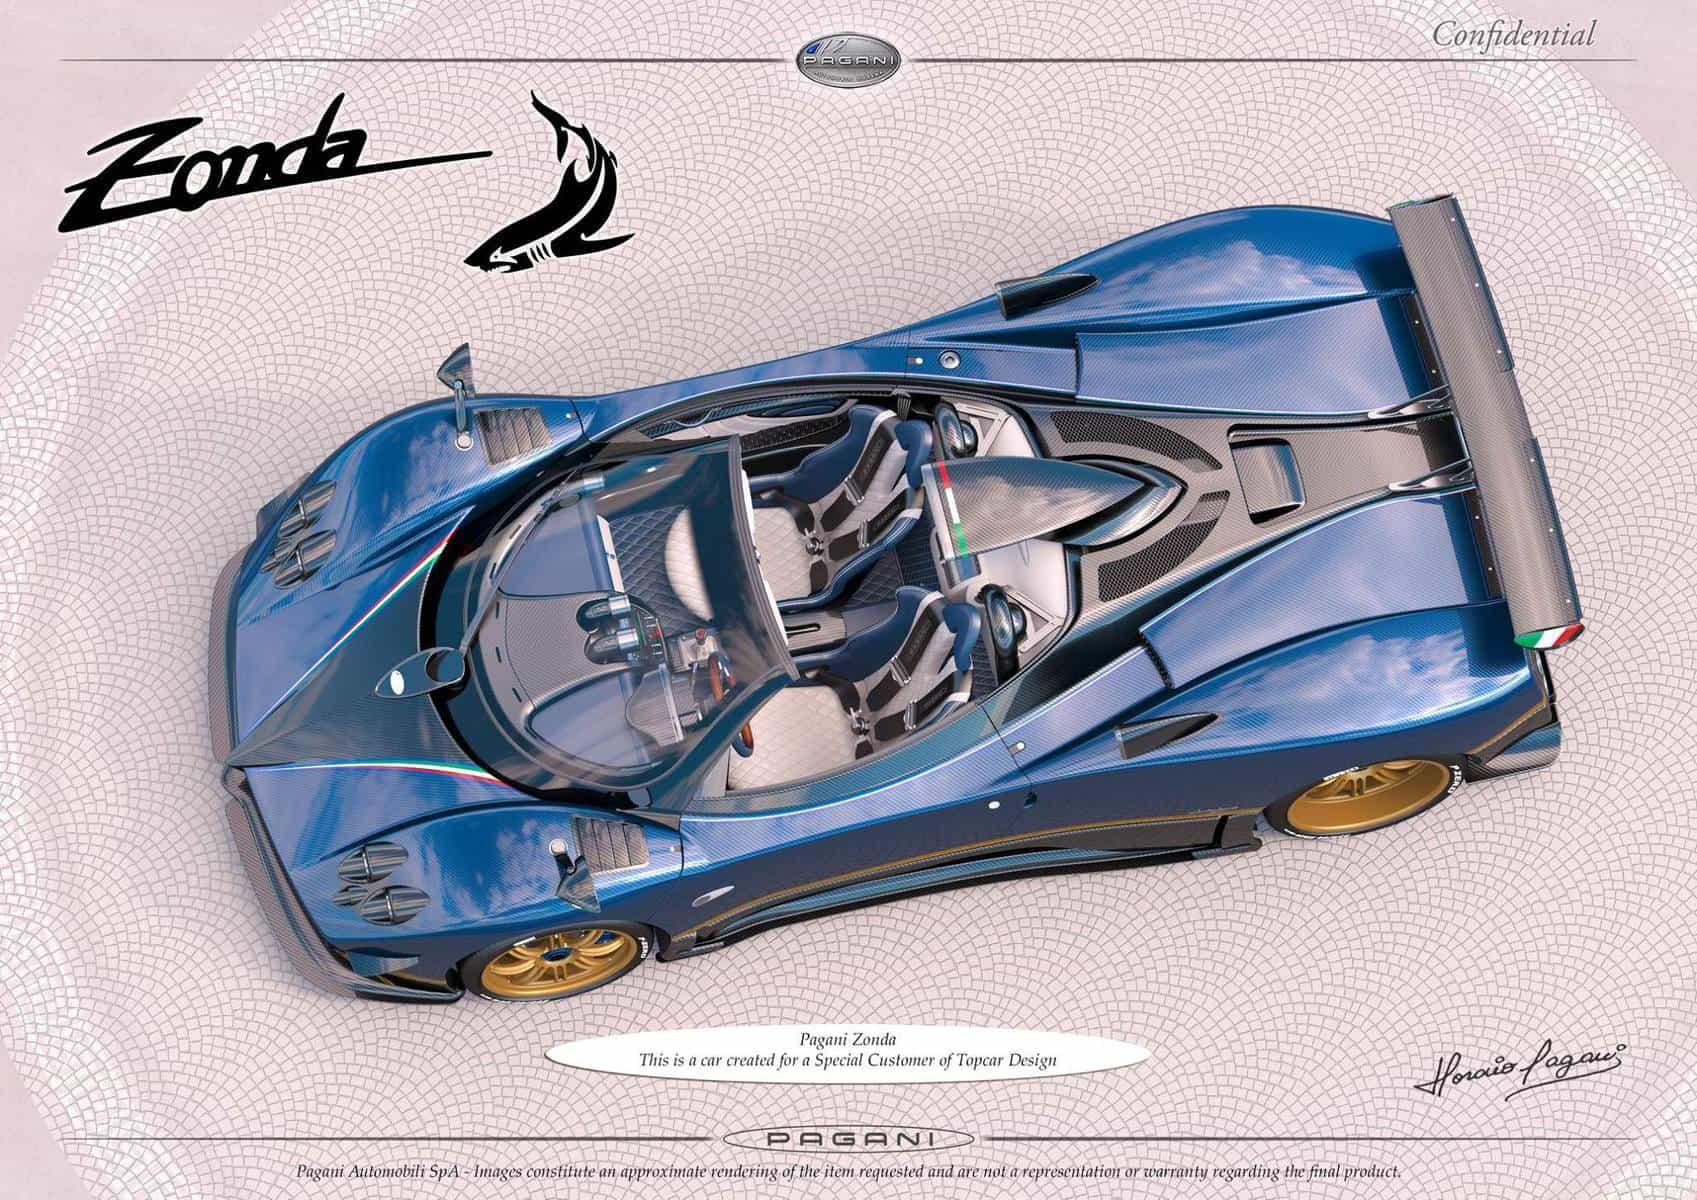 Pagani Zonda S Roadster TopCar